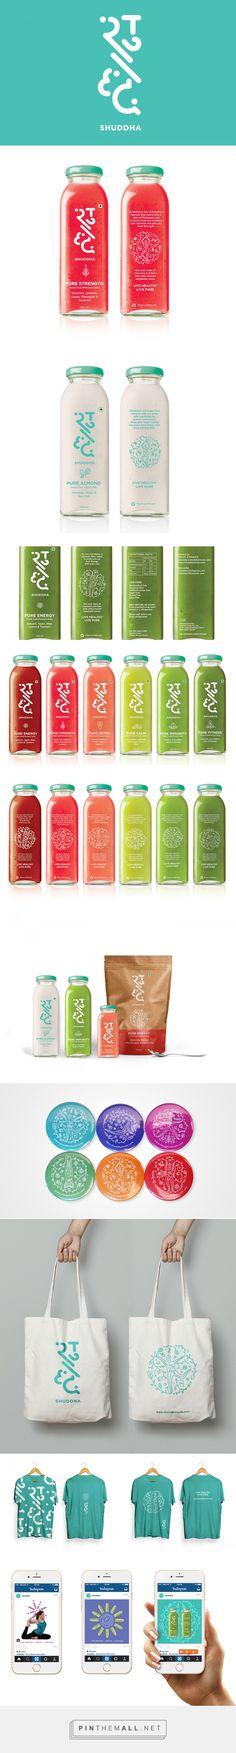 Shuddha Brand Fresh Cold Pressed Juice Packaging by Ishita Jain | Fivestar Branding – Design and Branding Agency & Inspiration Gallery